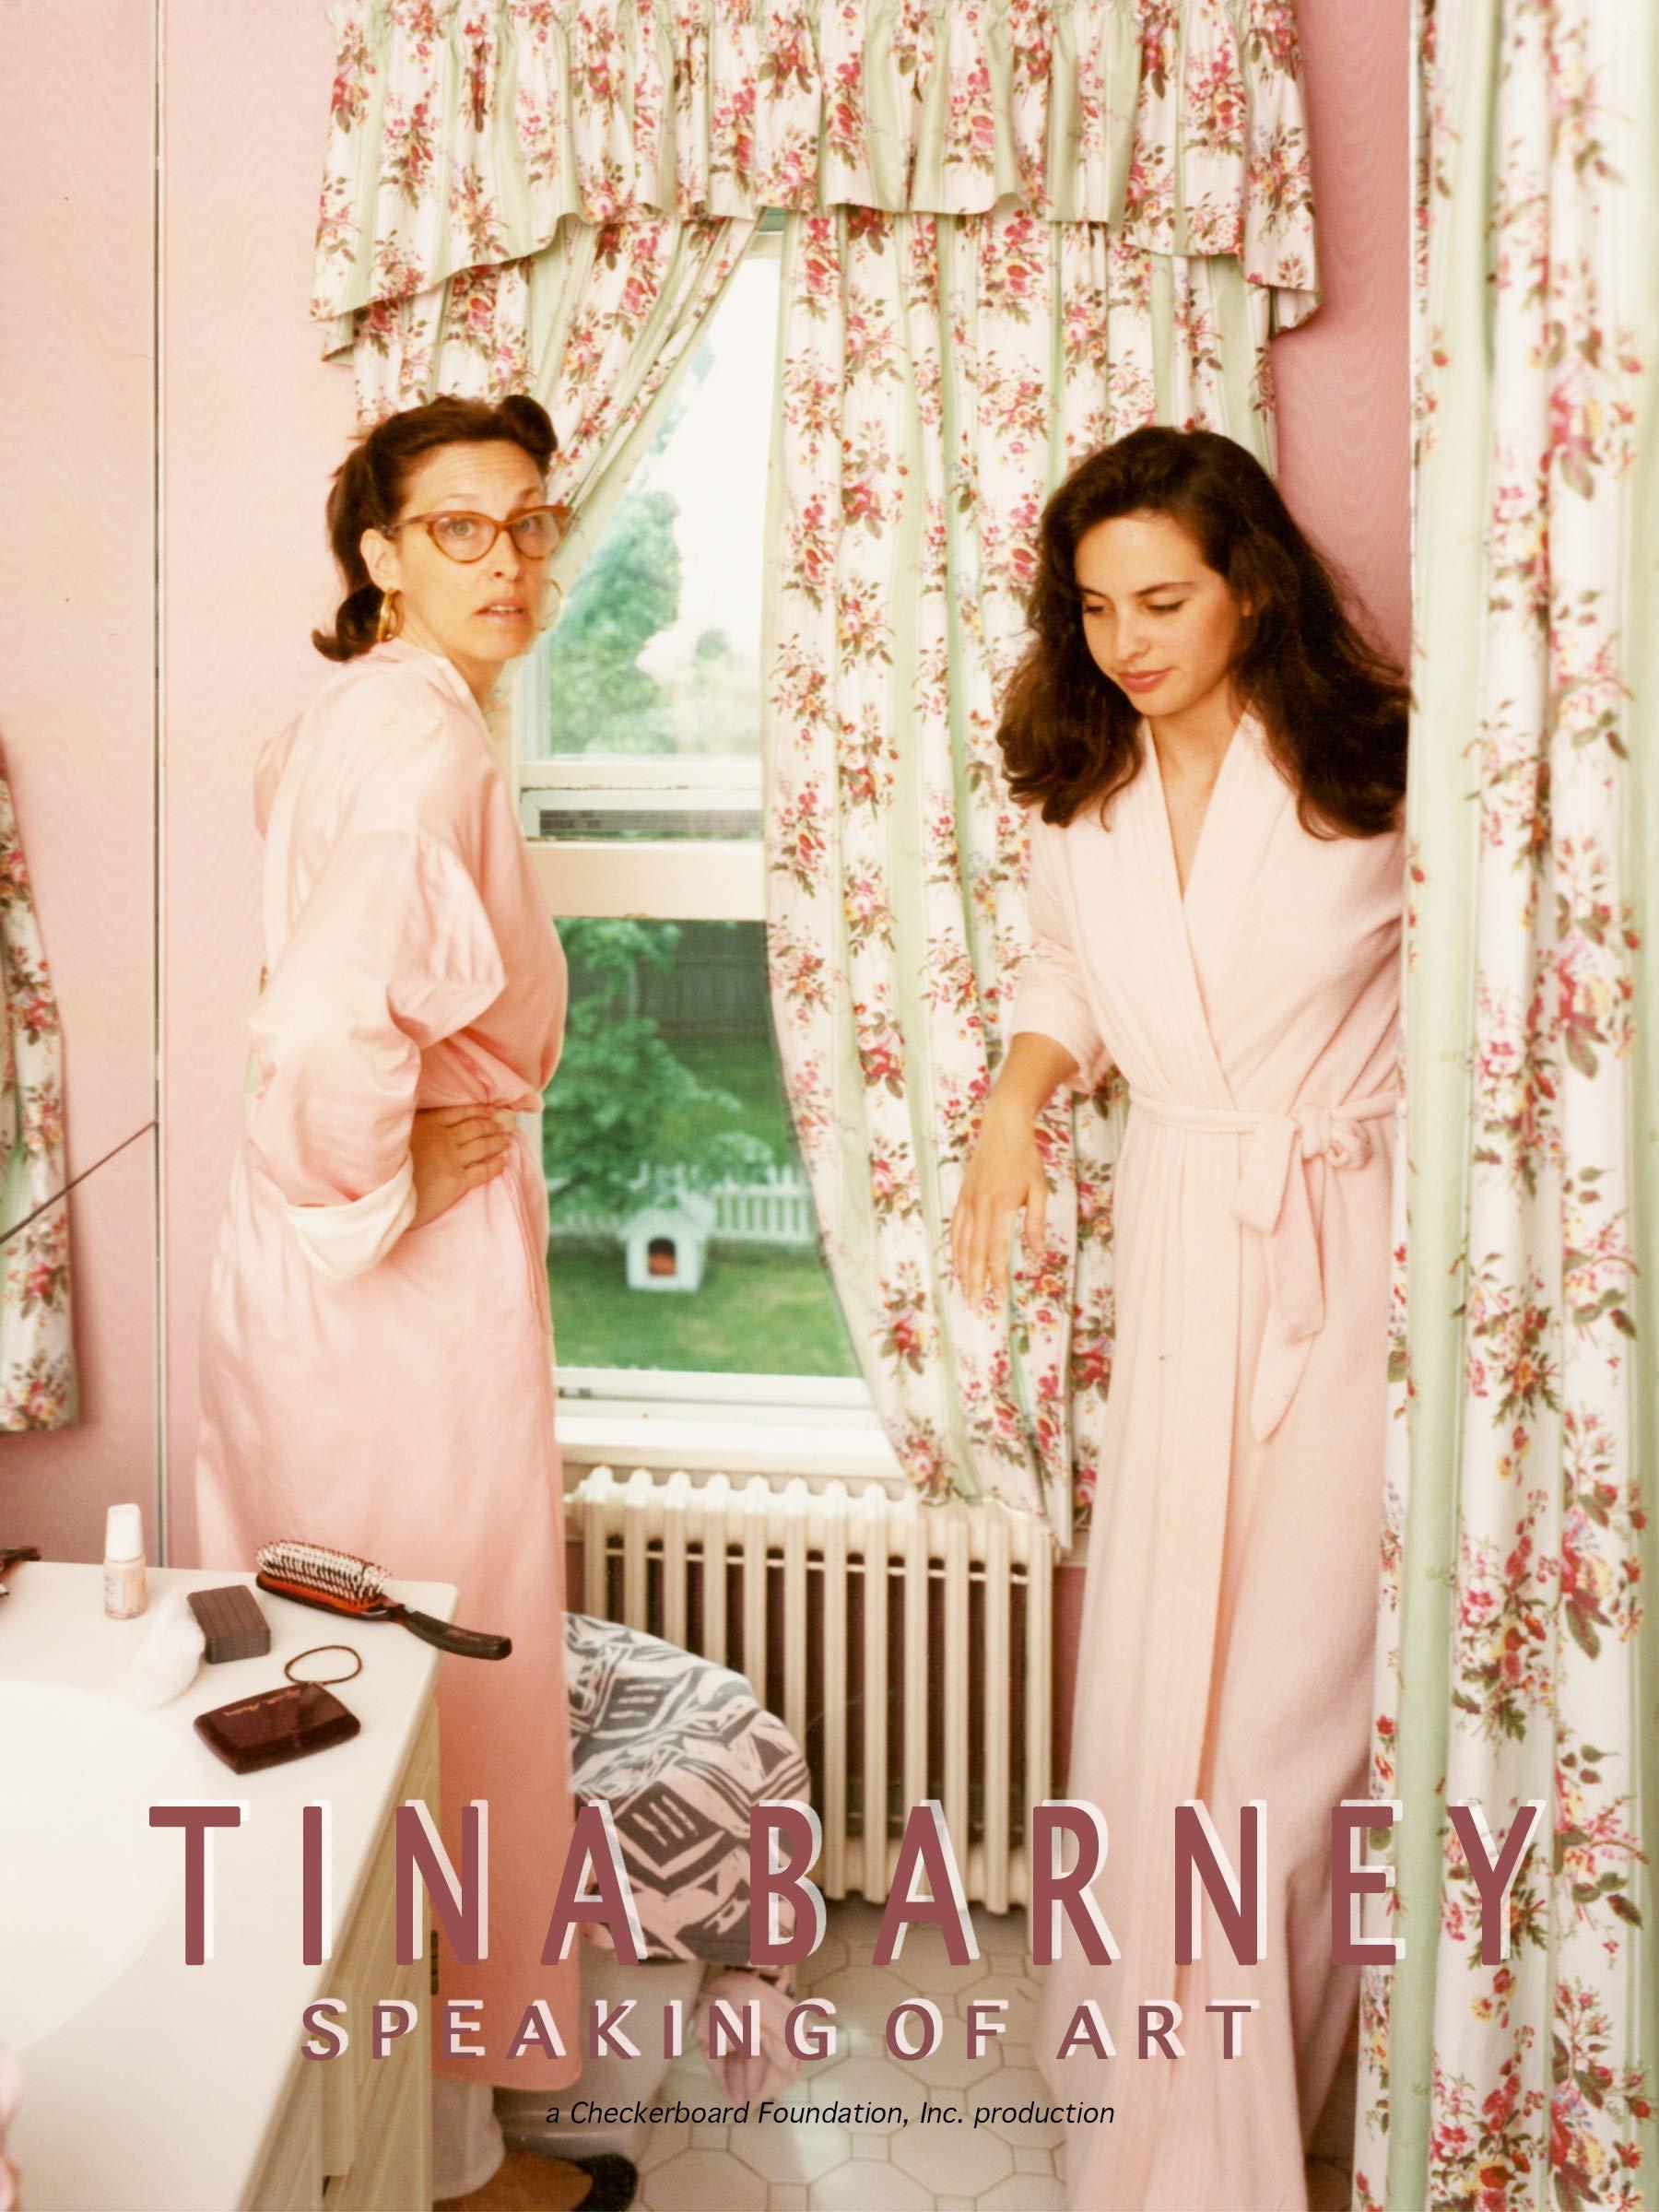 Speaking of Art: Tina Barney